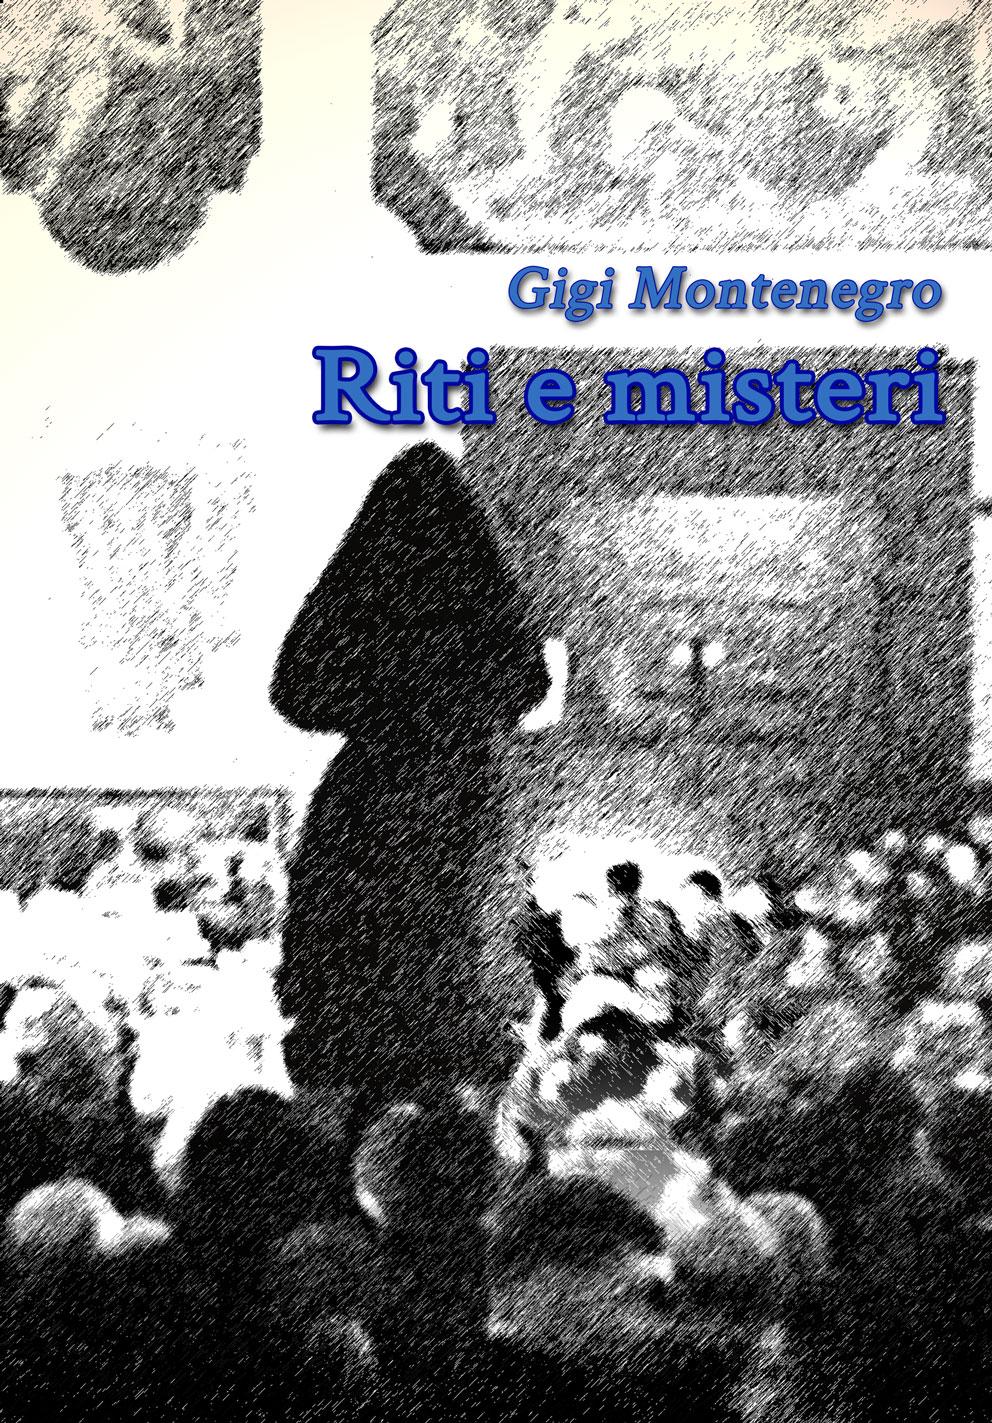 Riti e Misteri Gigi Montenegro